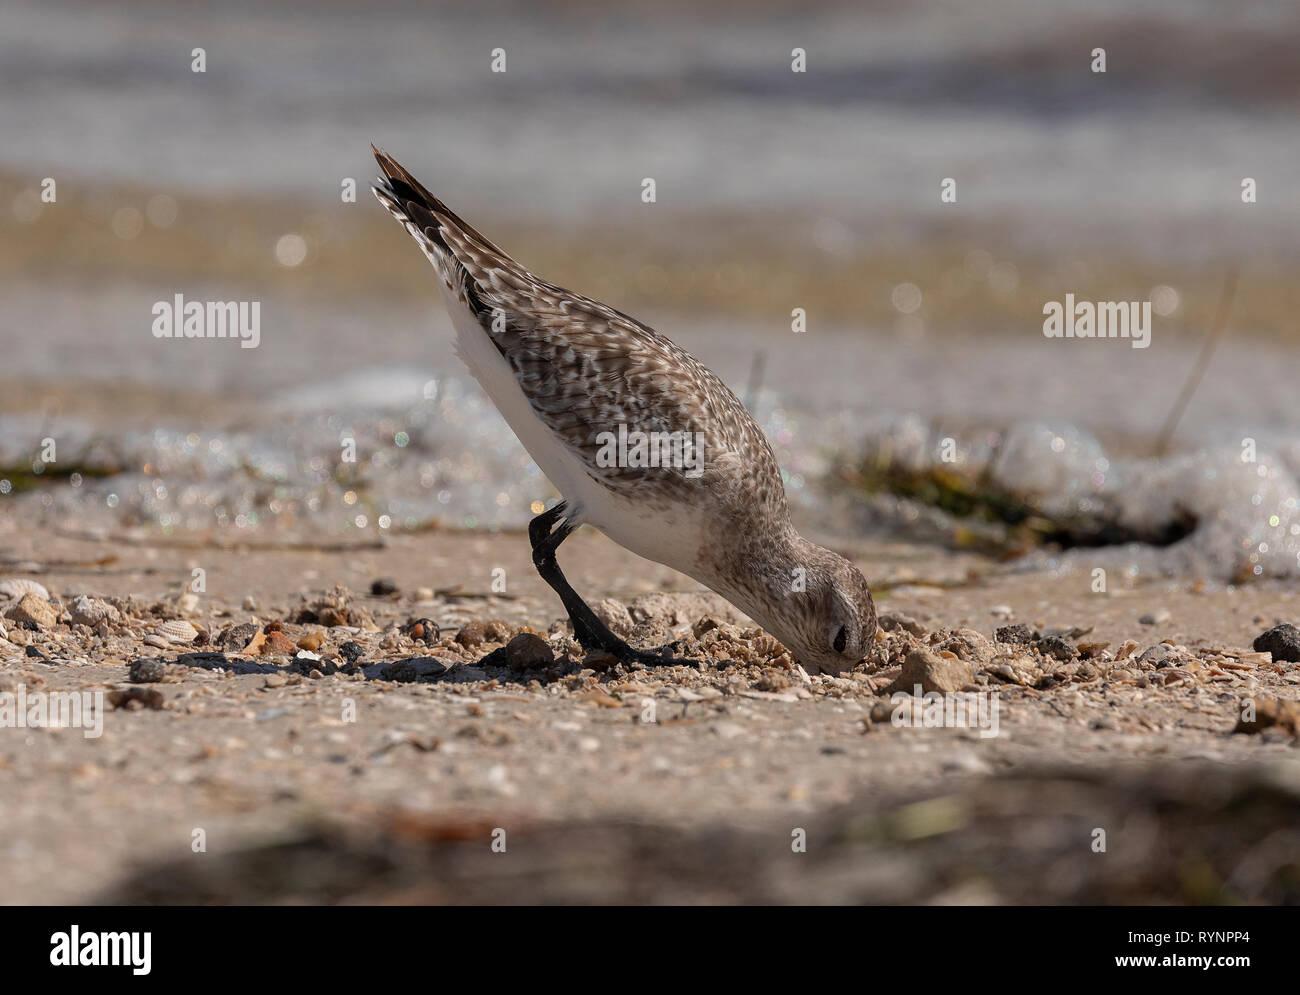 Black-bellied Plover, Pluvialis squatarola, in winter plumage feeding along the tideline. Florida Stock Photo